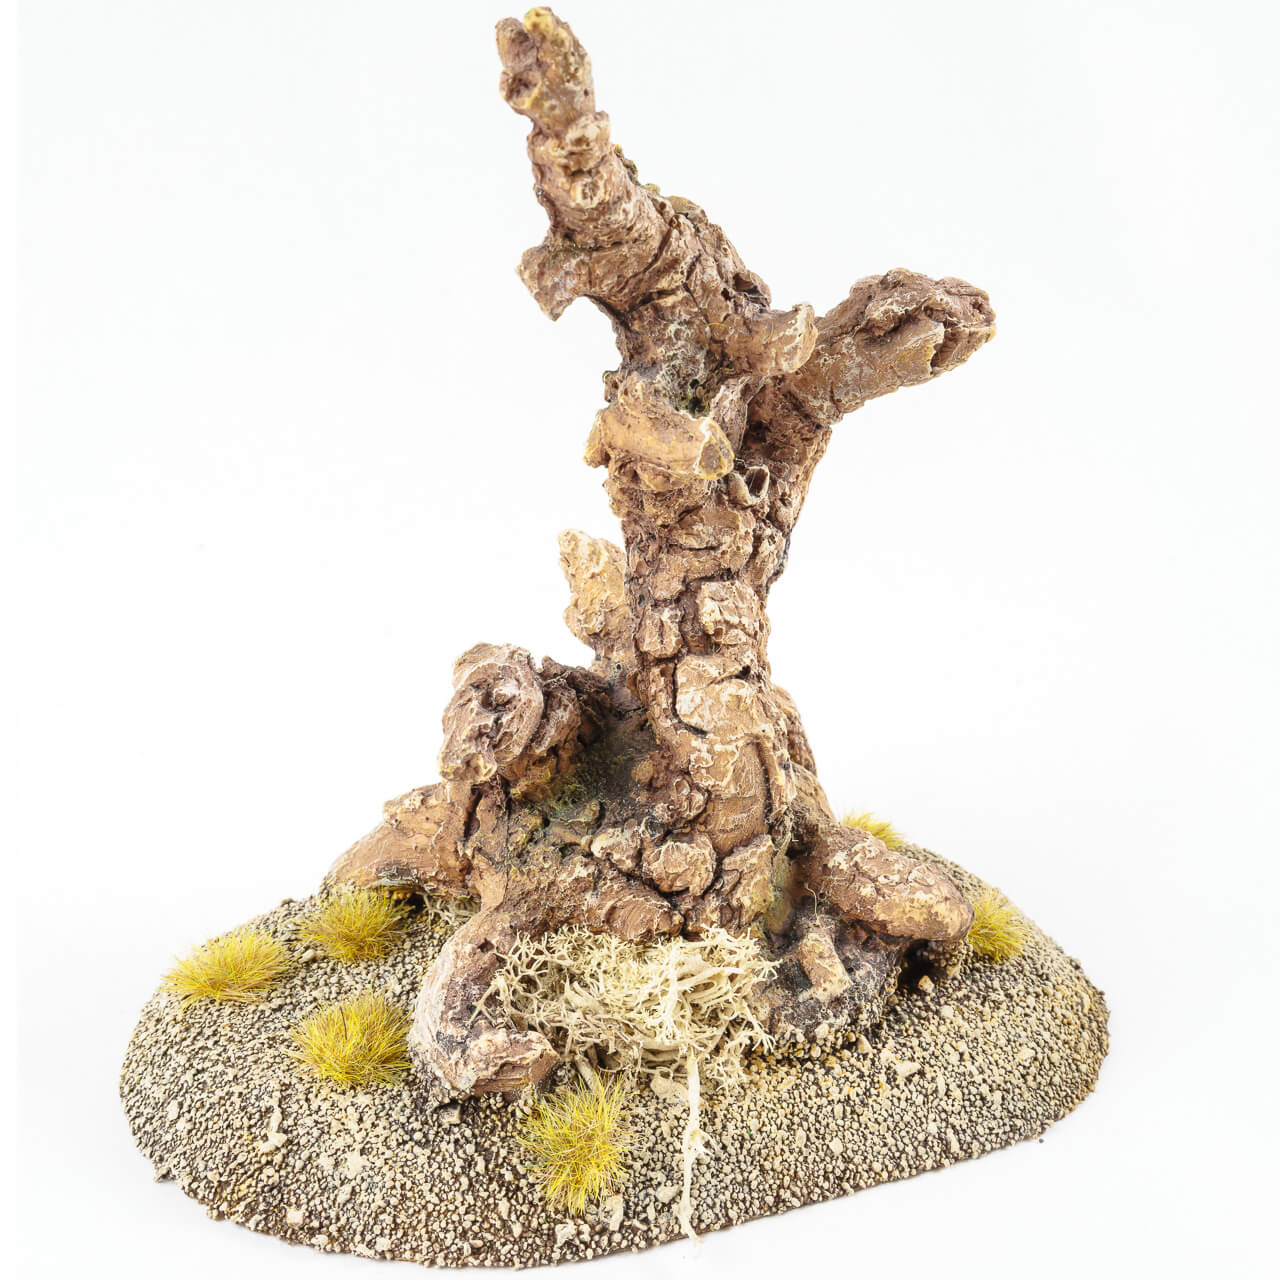 1. Produktabbildung - Verdorrter Baum